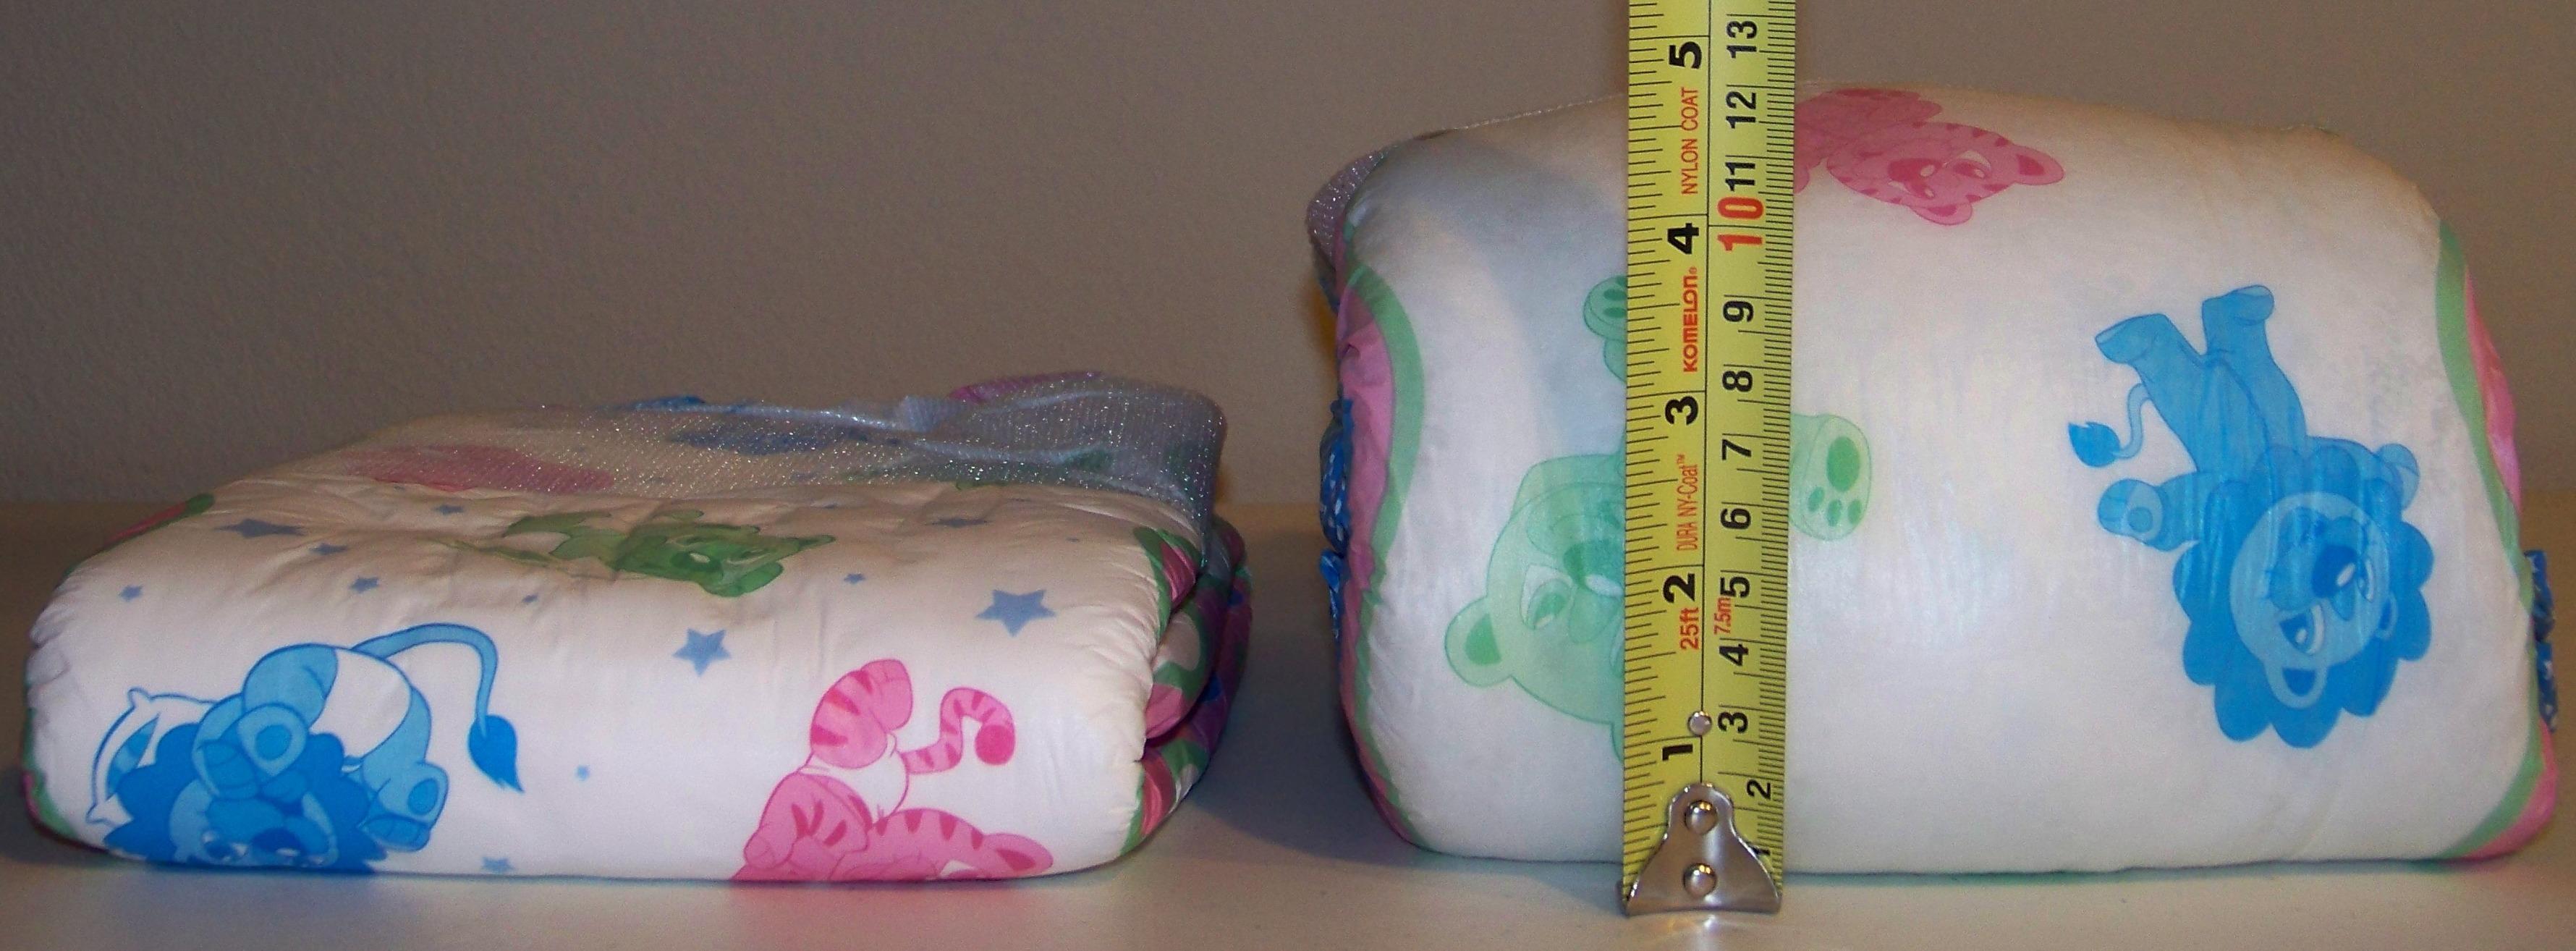 Dry Diaper Next to Full Diaper After Quantitative Test